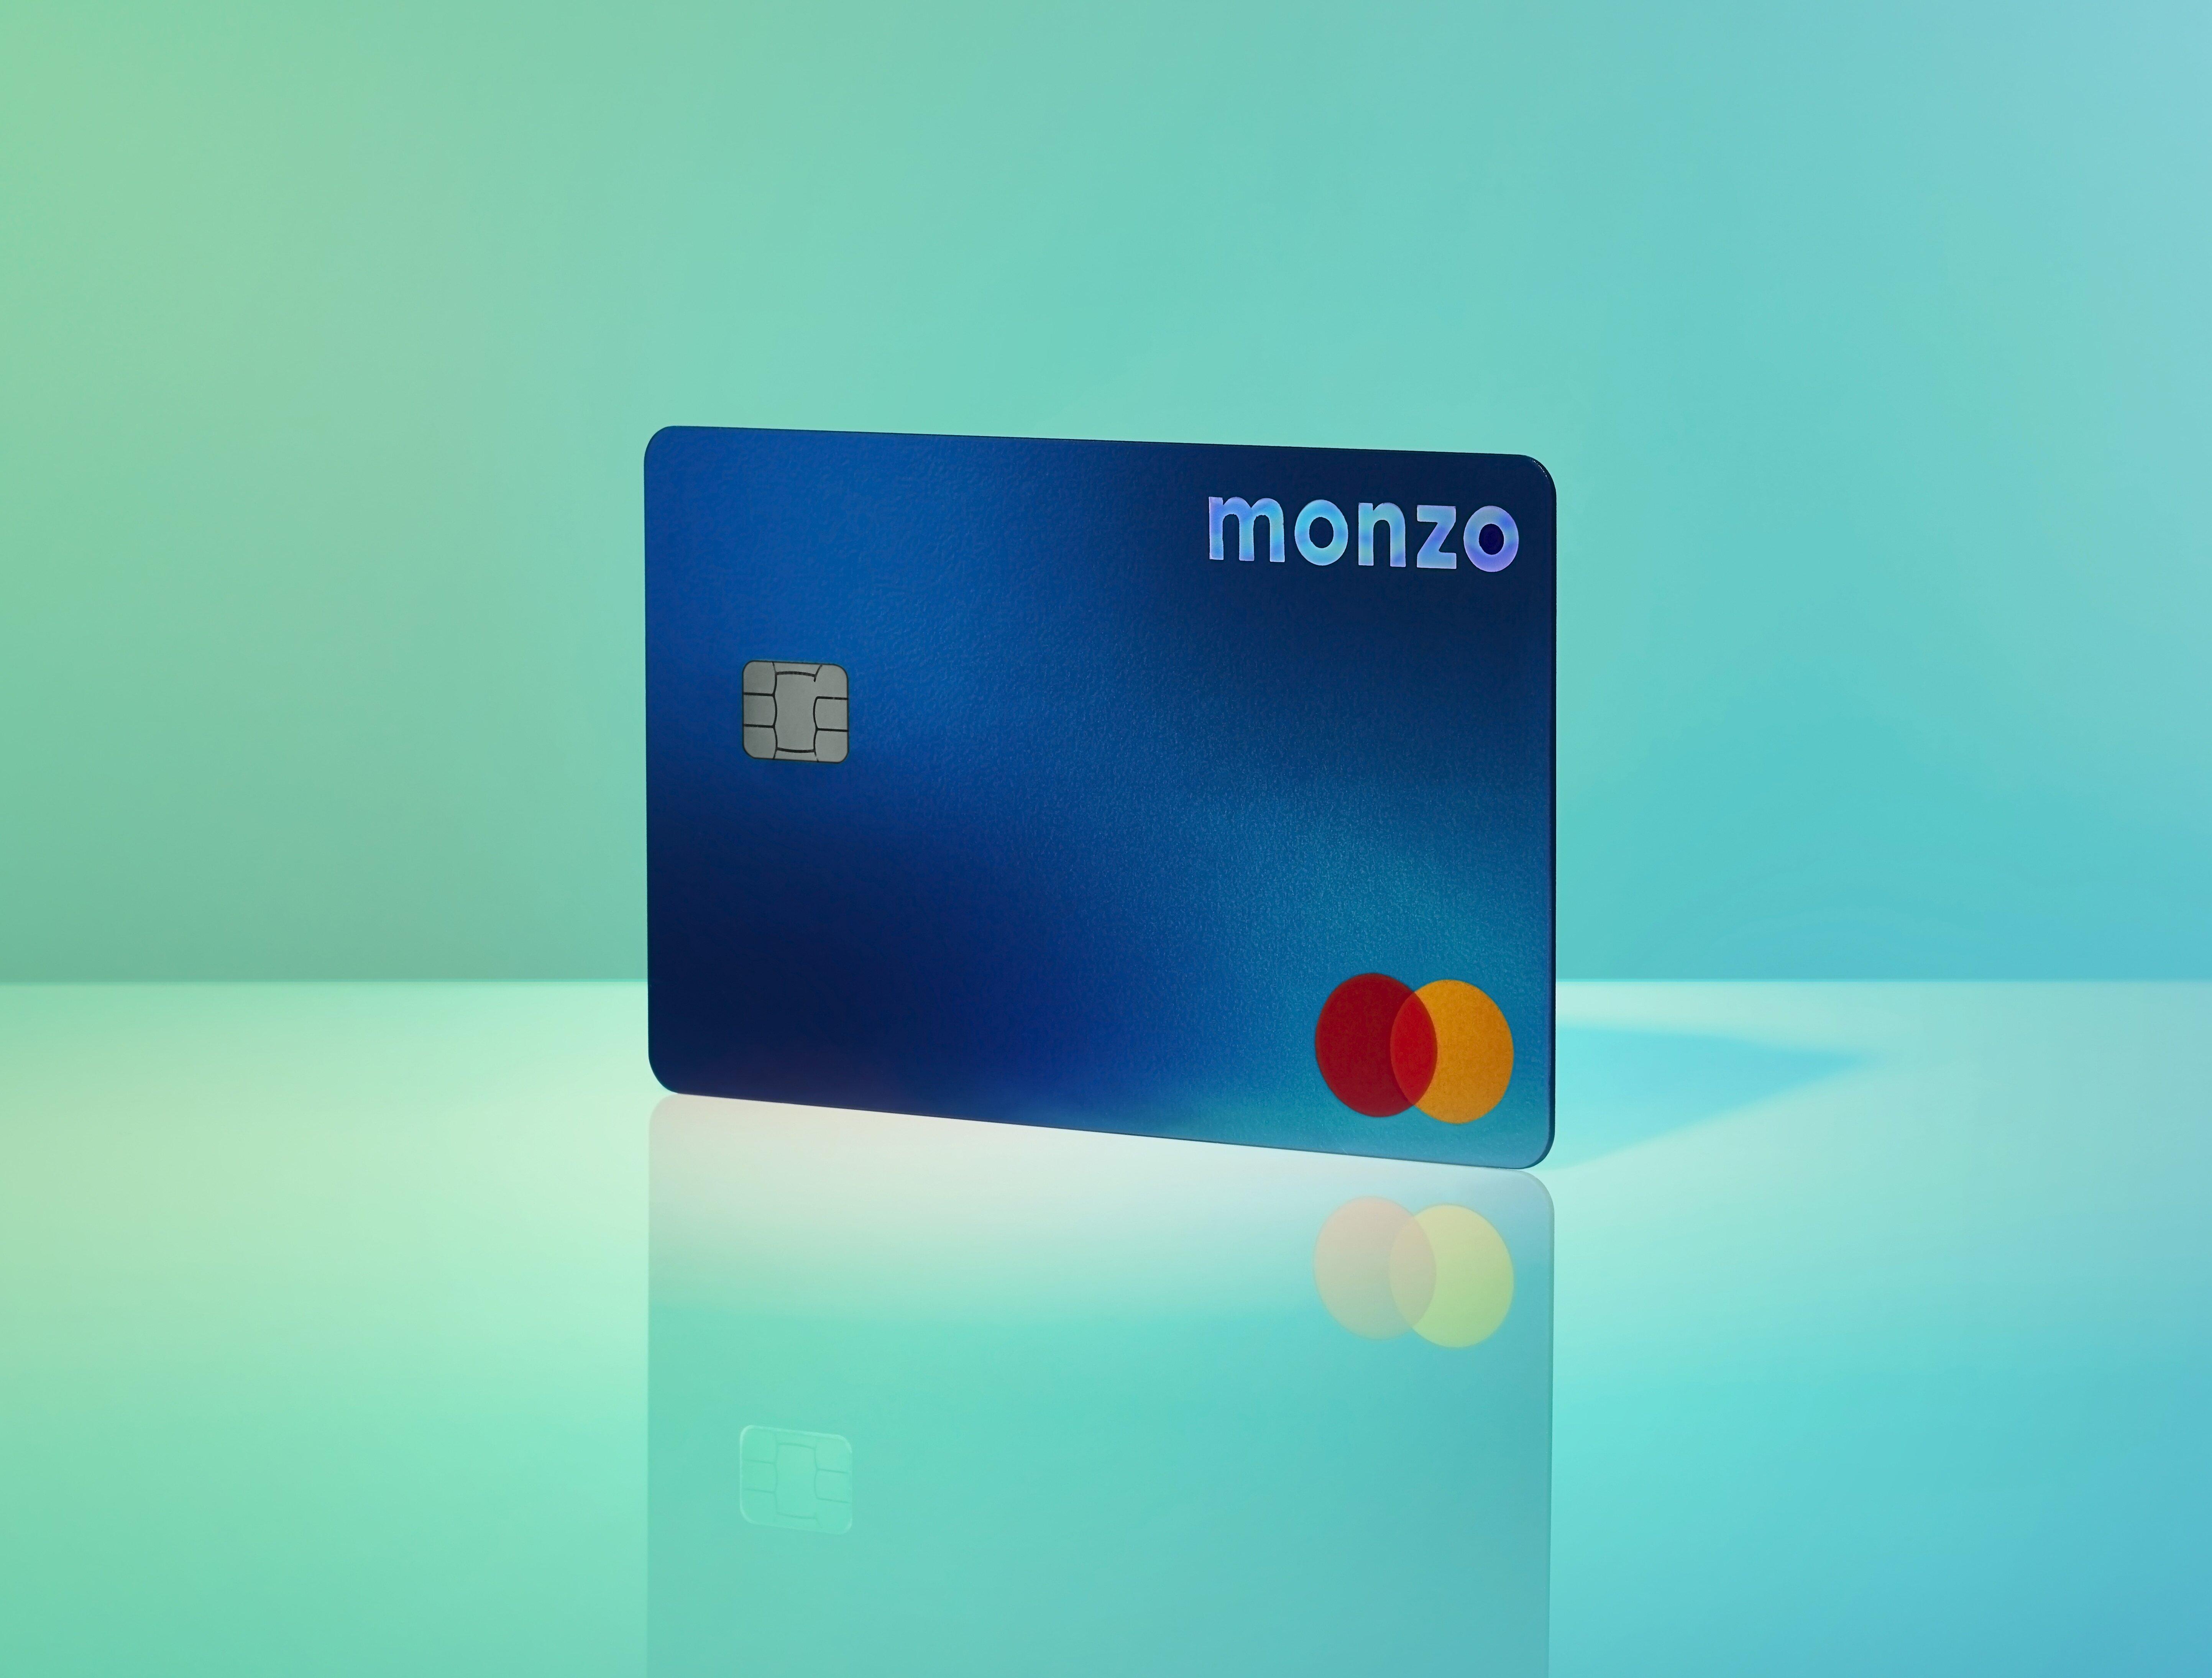 techcrunch.com - Steve O'Hear - Monzo, the U.K. challenger bank, picks up additional £60M in funding